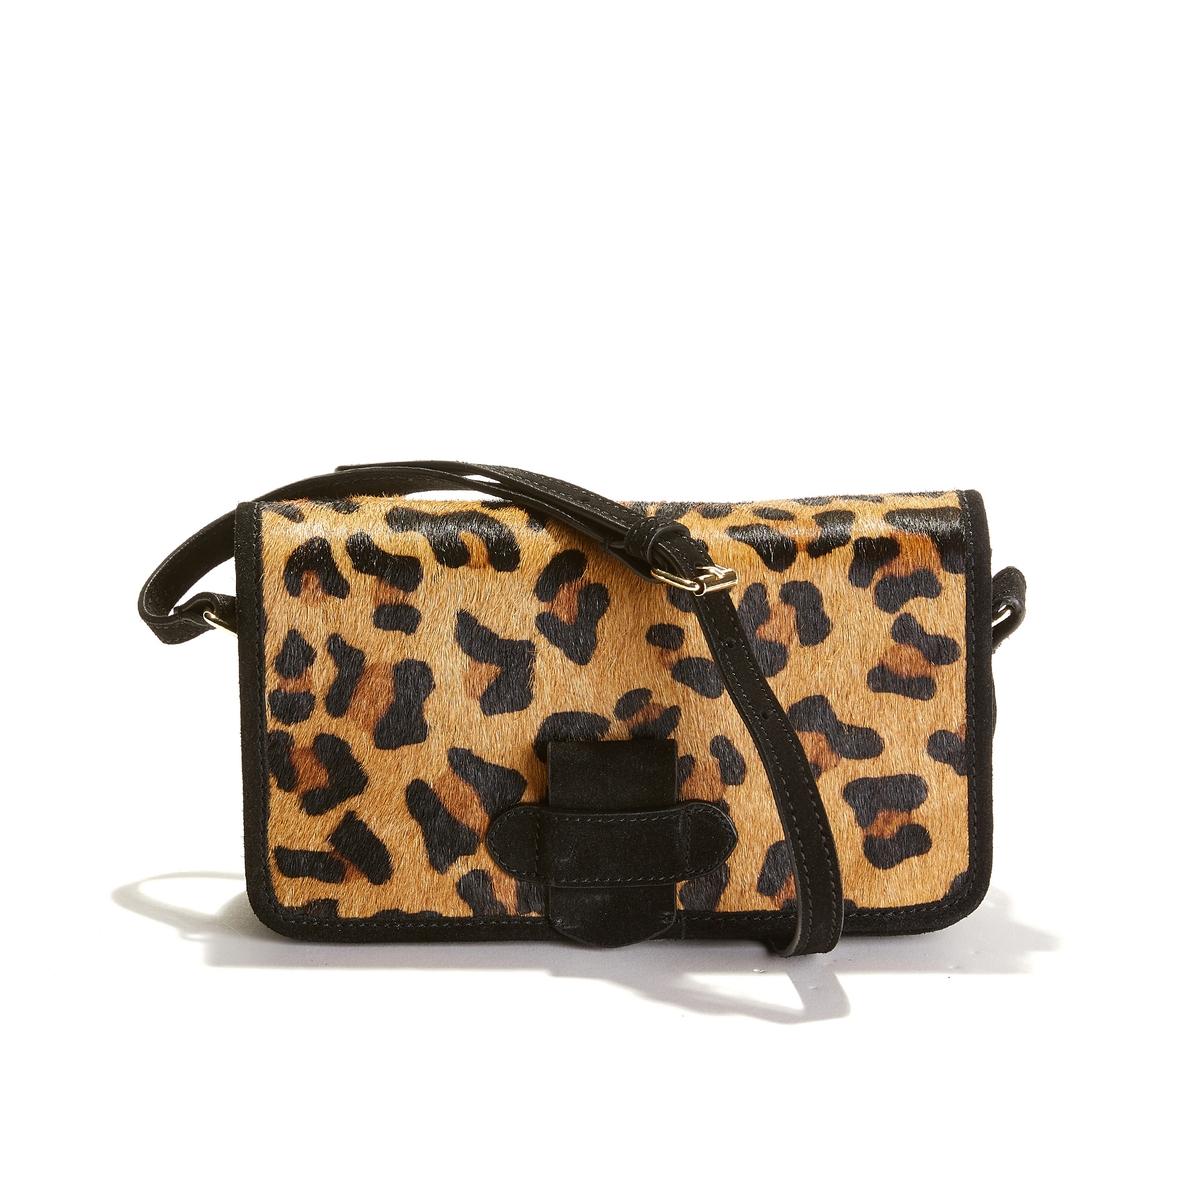 Bolso de mano con solapa y motivo estilo leopardo